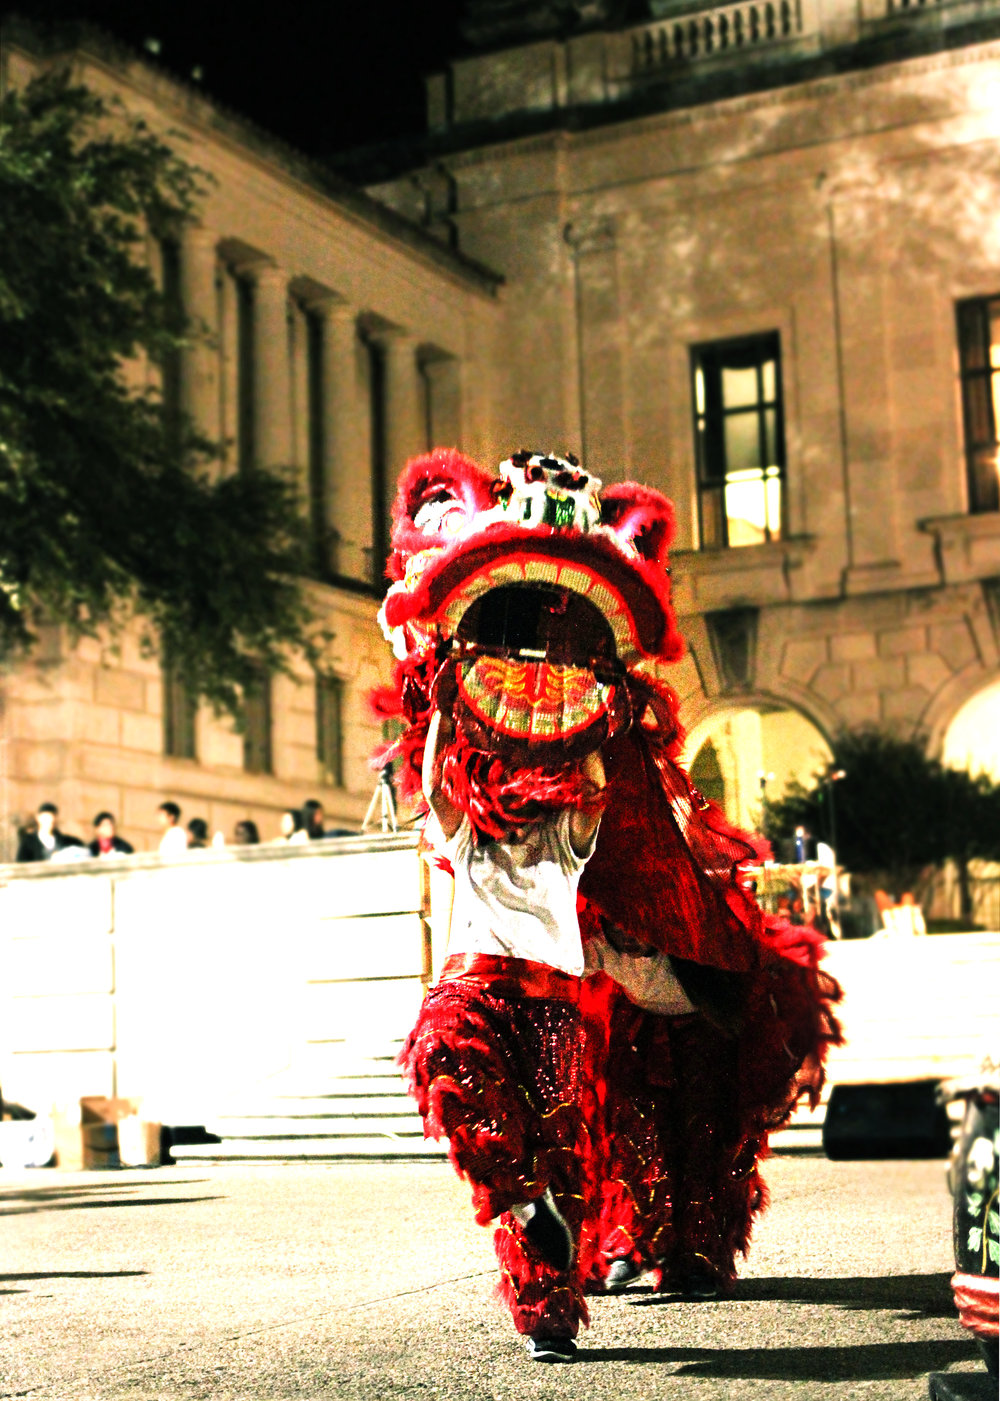 The Texas Dragon Dance Team roars.